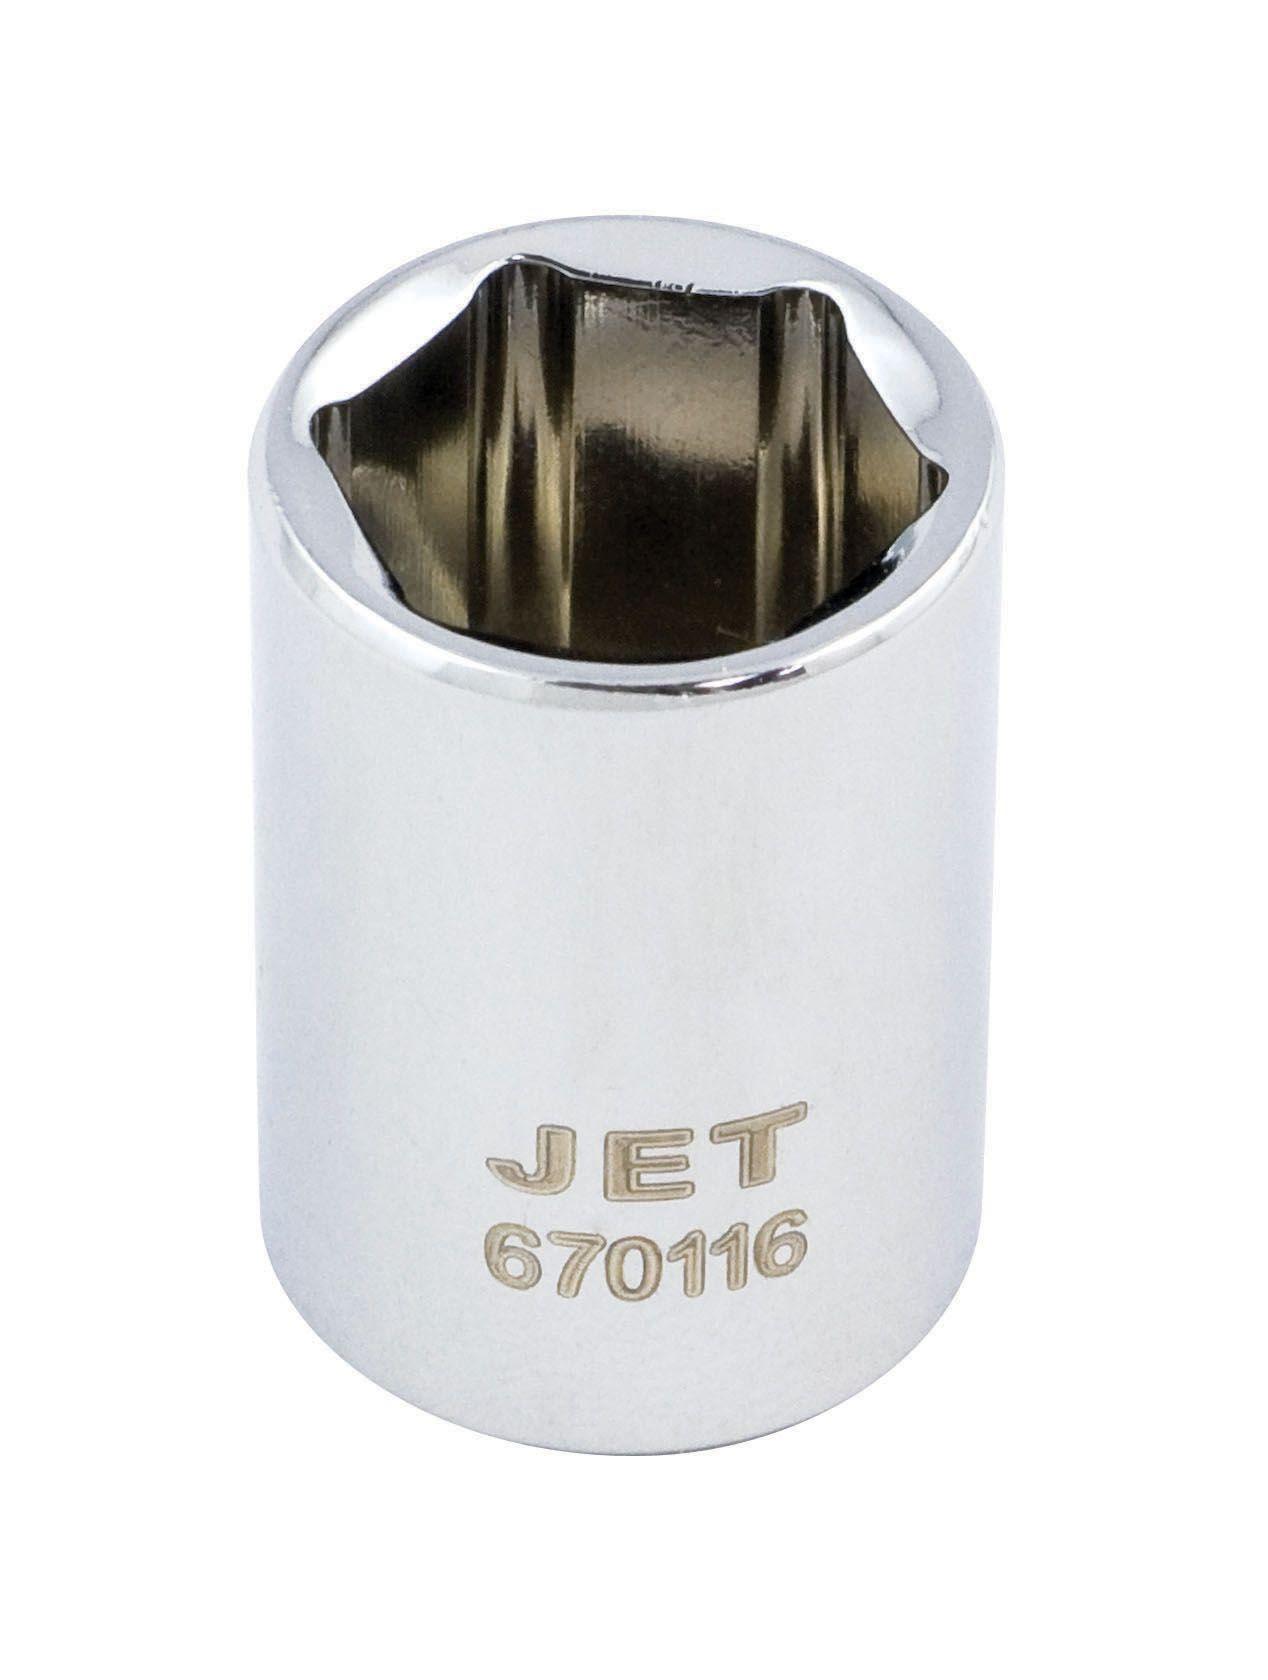 Jet 670106 Douille 3/16